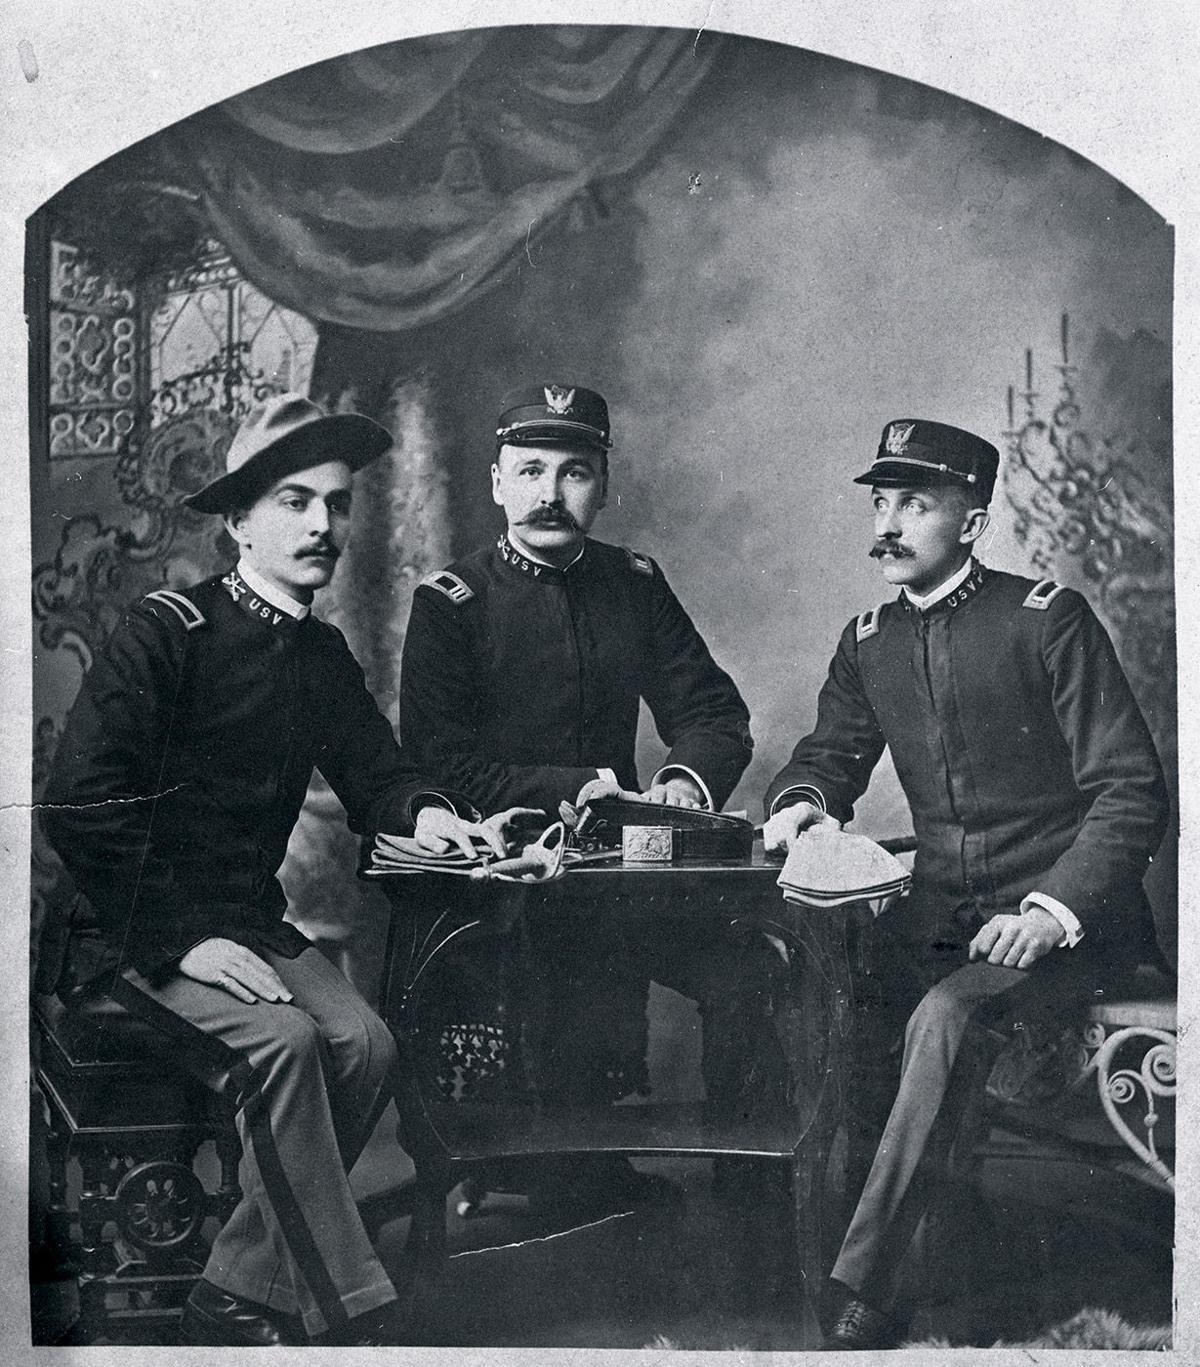 Will Cave in Spanish American War uniform